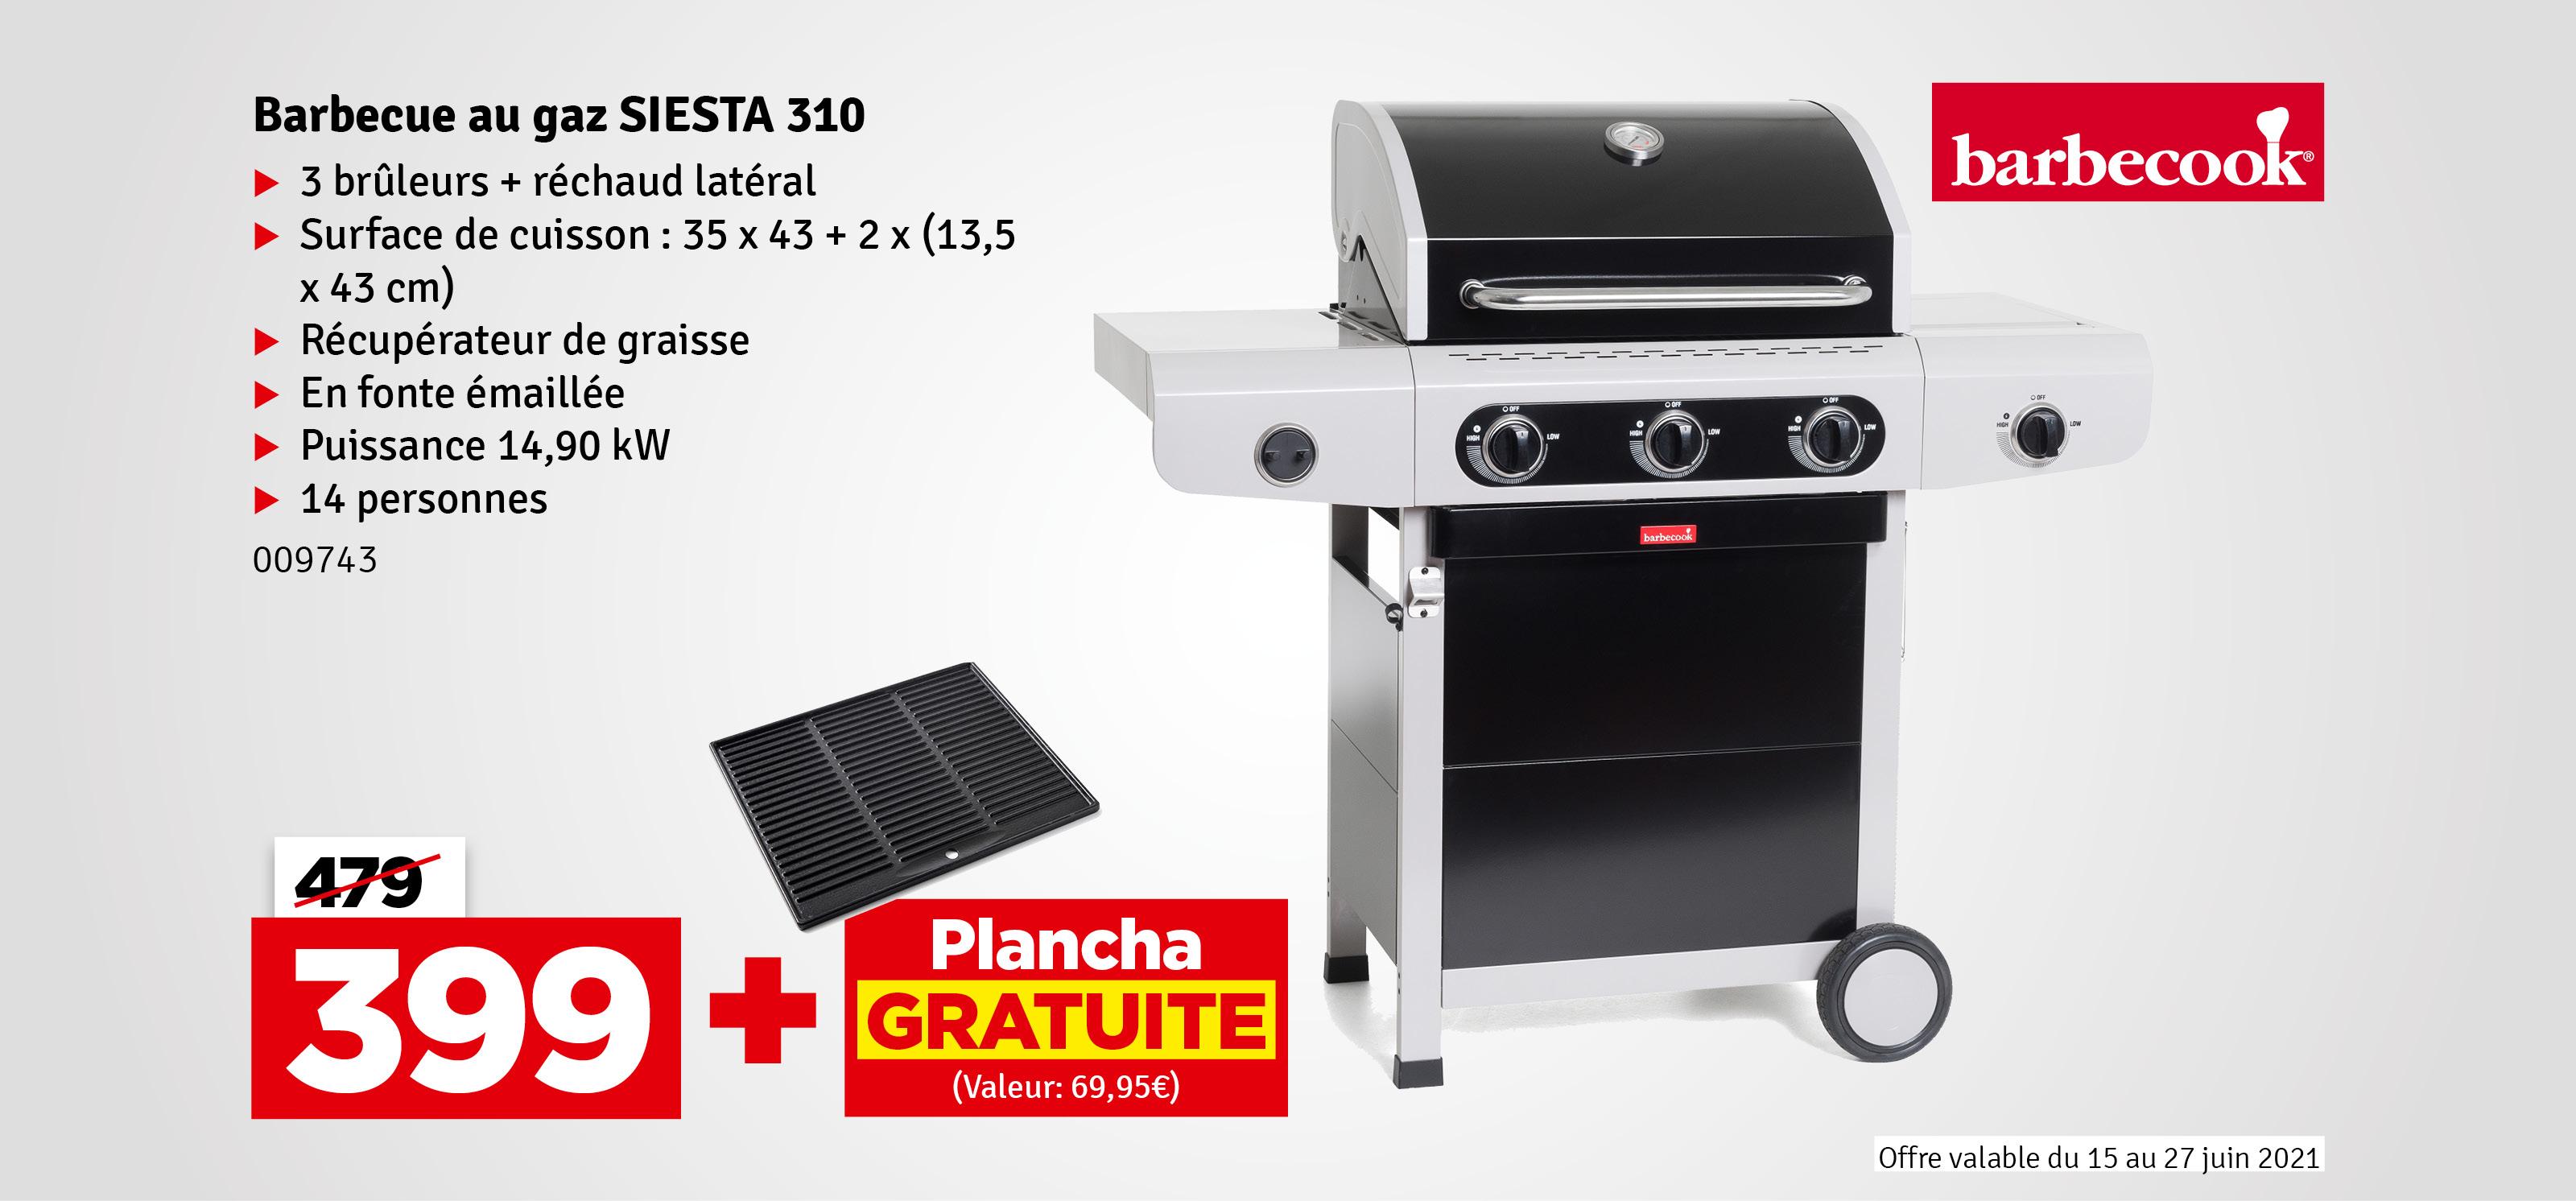 Promo - Barbecue au gaz Siesta 310 Black Edition BARBECOOK